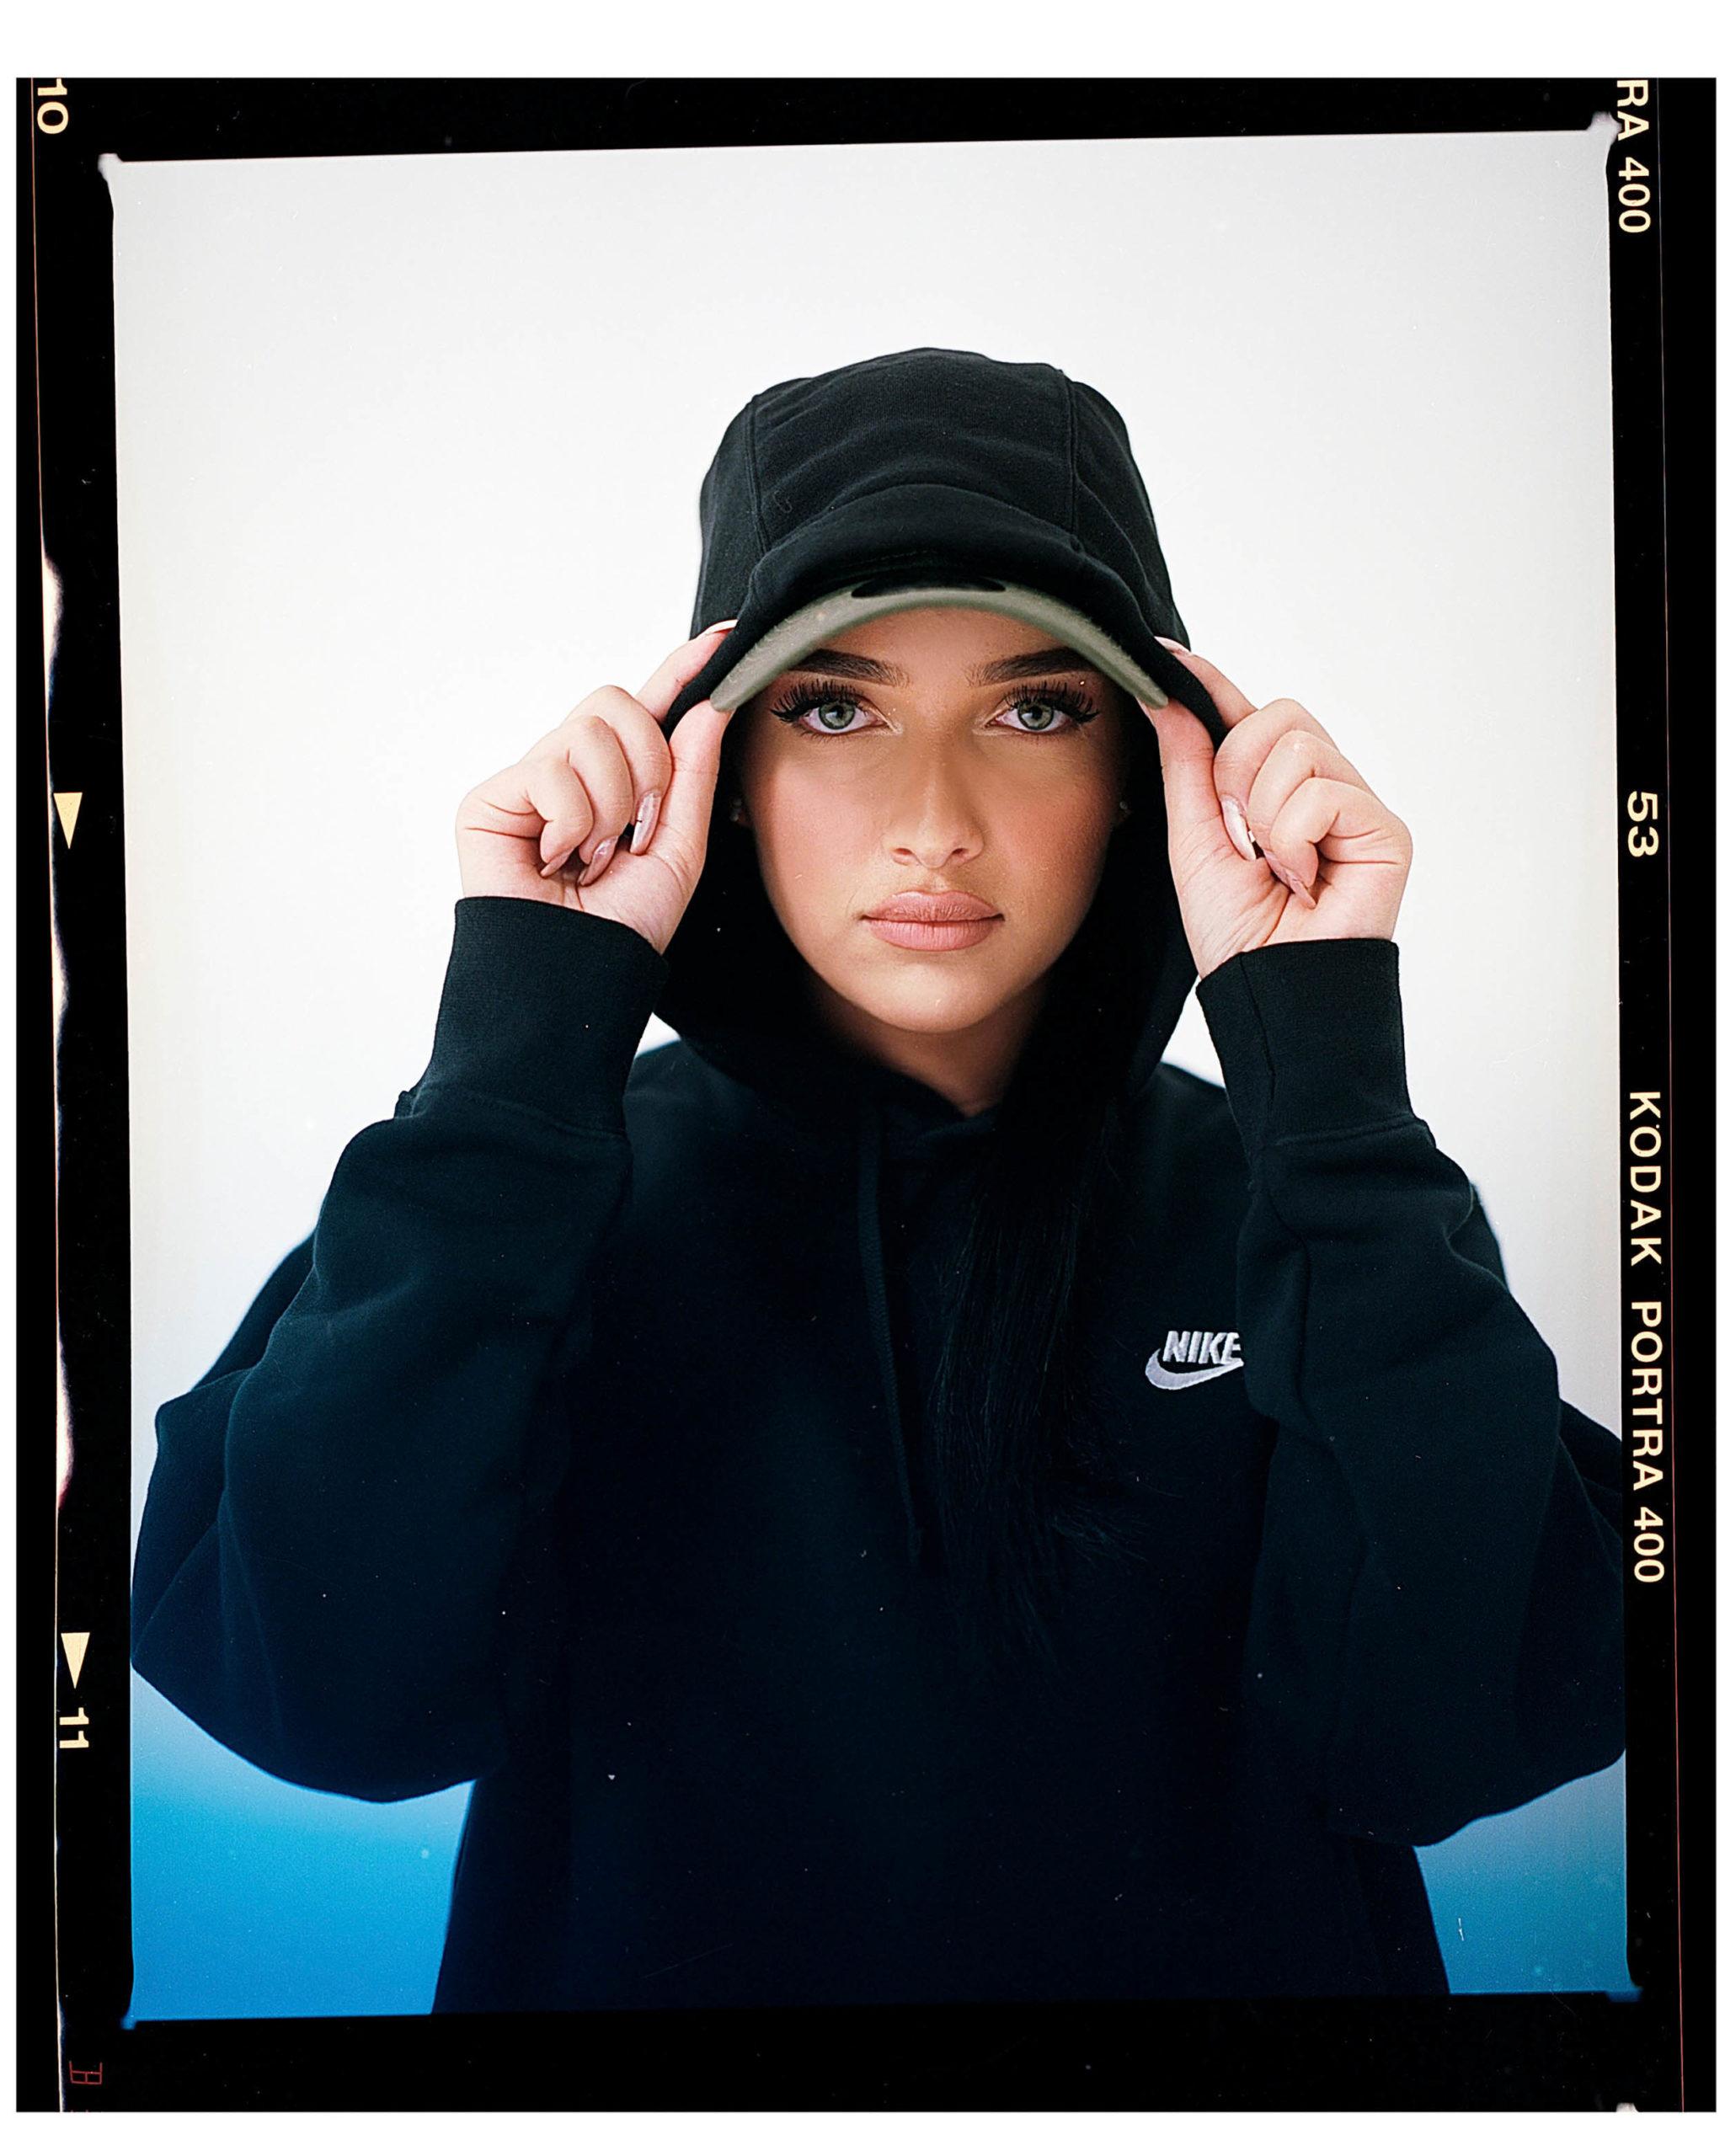 Delia-Baum_Photography_Berlin_Hava_002-1